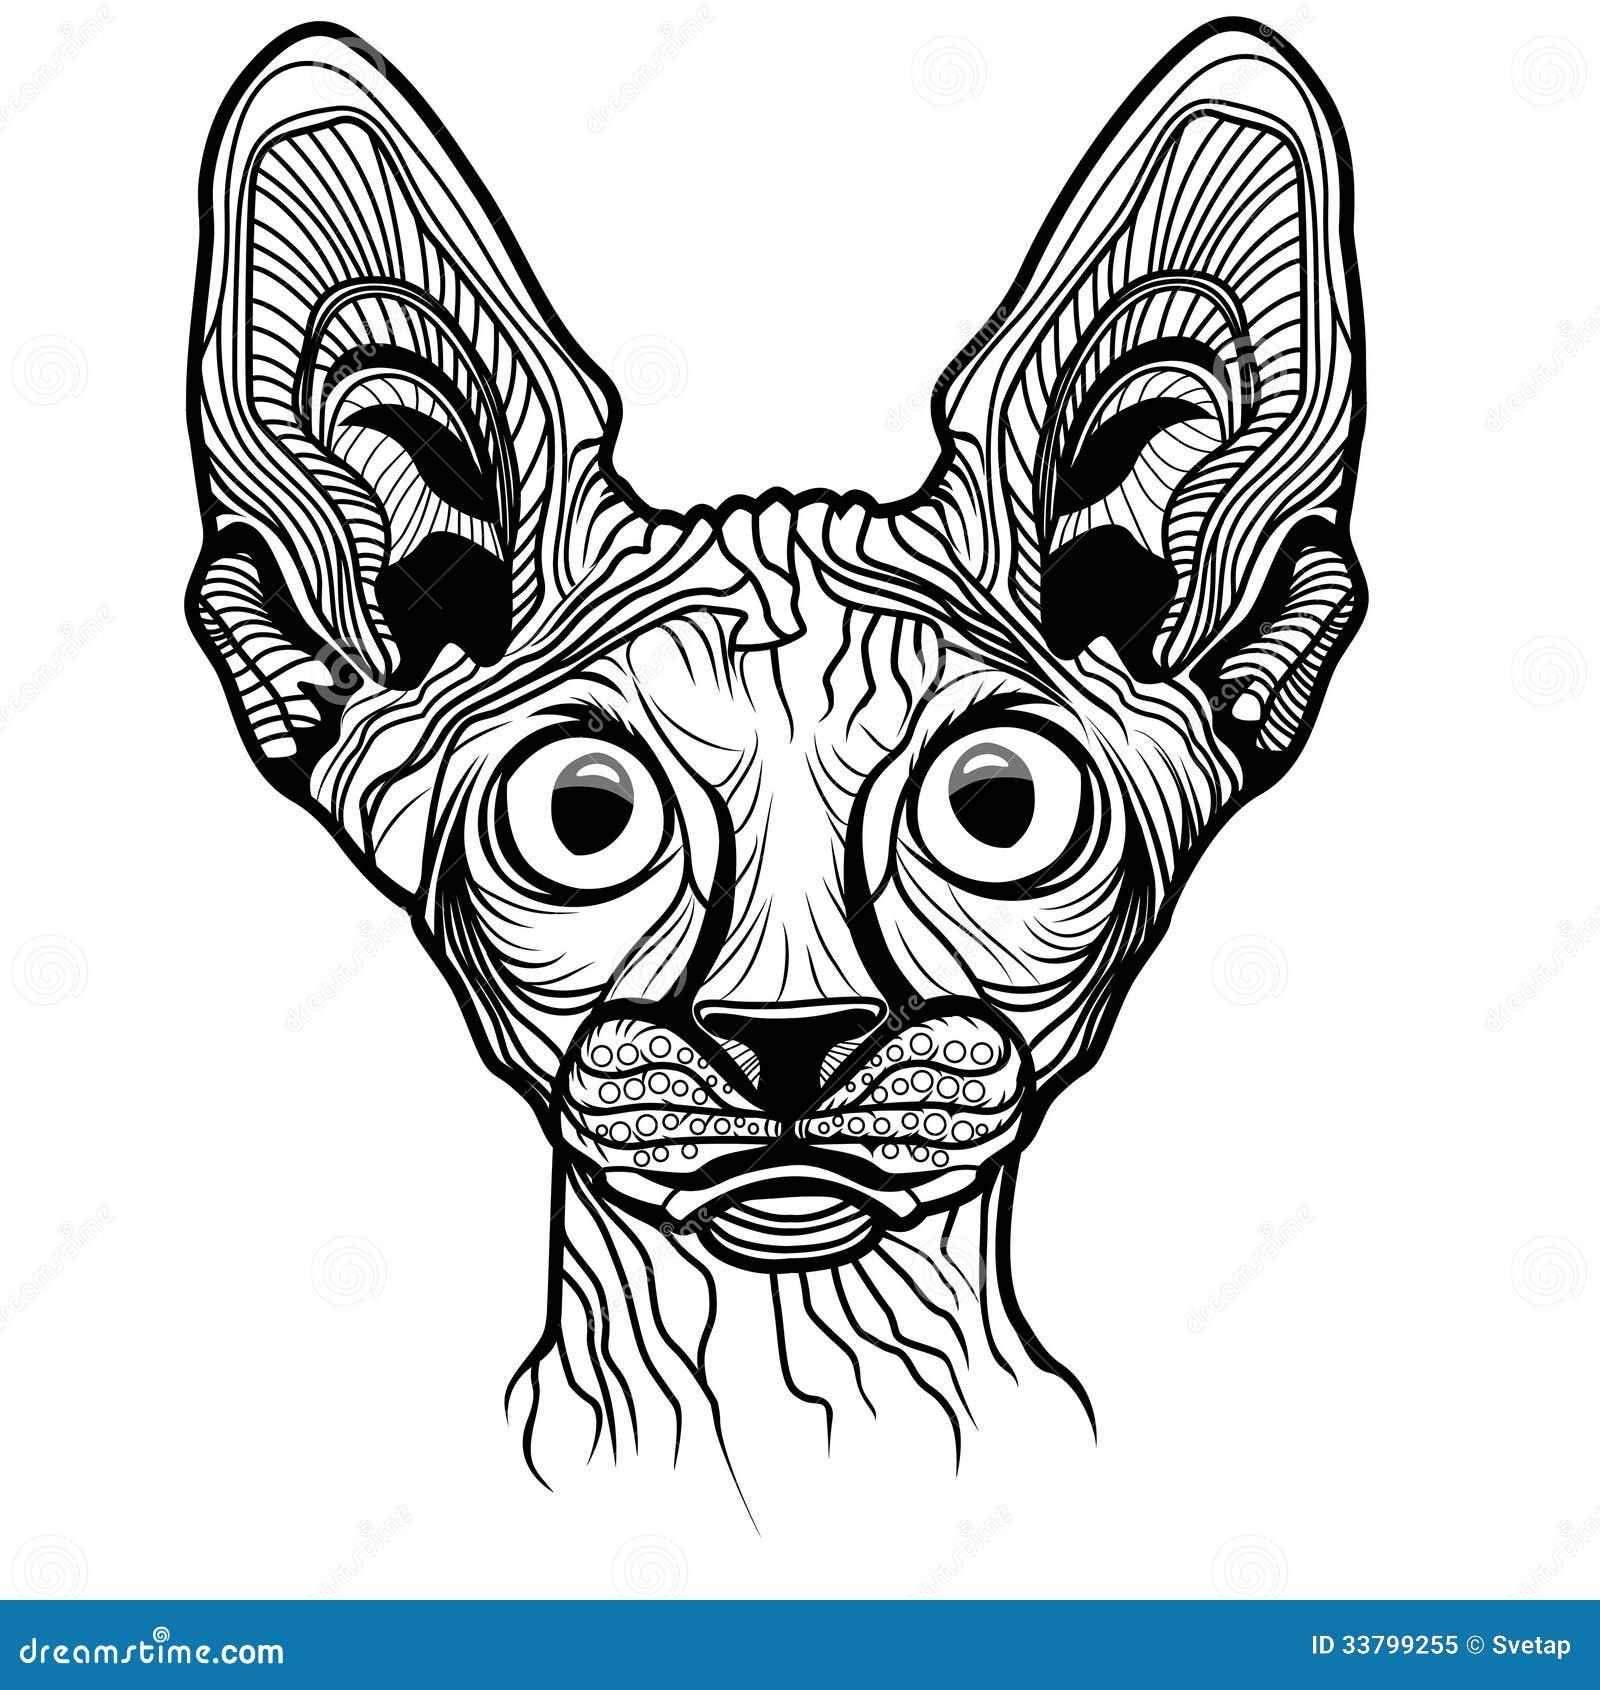 Vector Illustration Of Cat Head Royalty Free Stock Photo Image 33799255